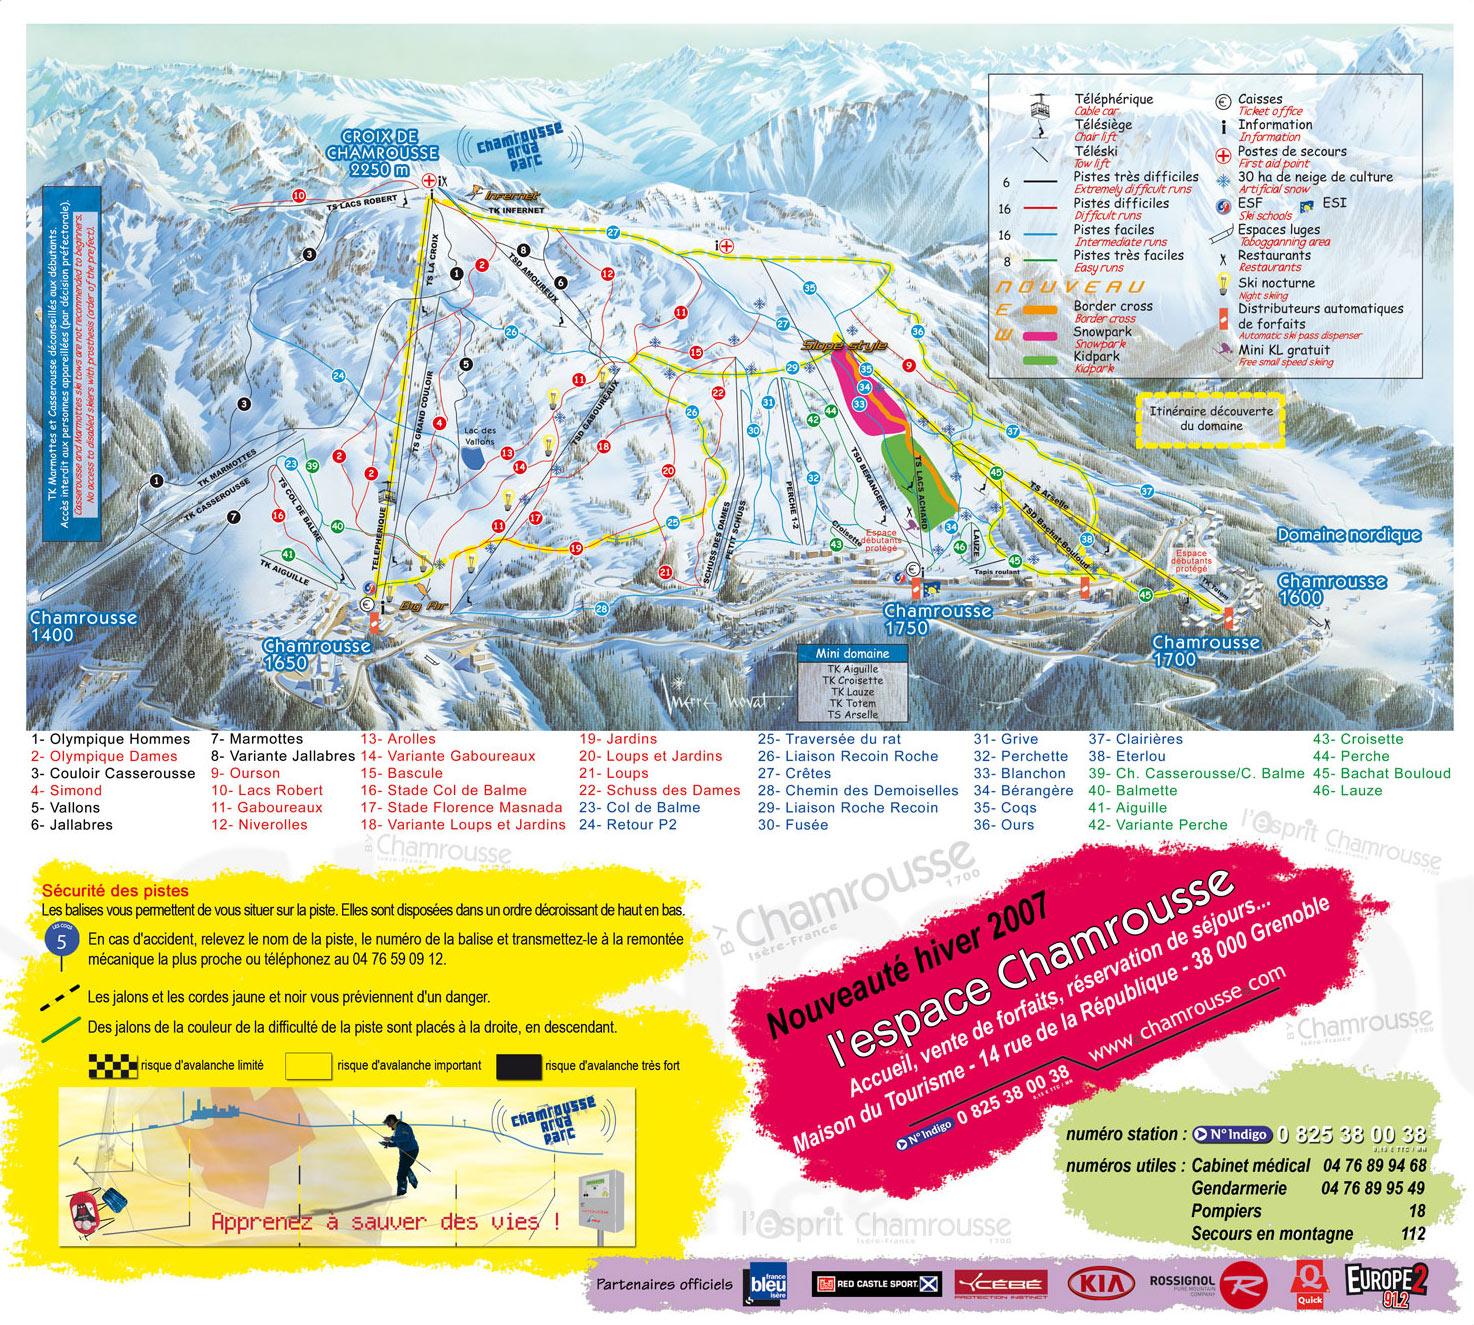 Recherche de restaurants d 39 altitude restaurant d 39 - Restaurant d altitude chamrousse ...